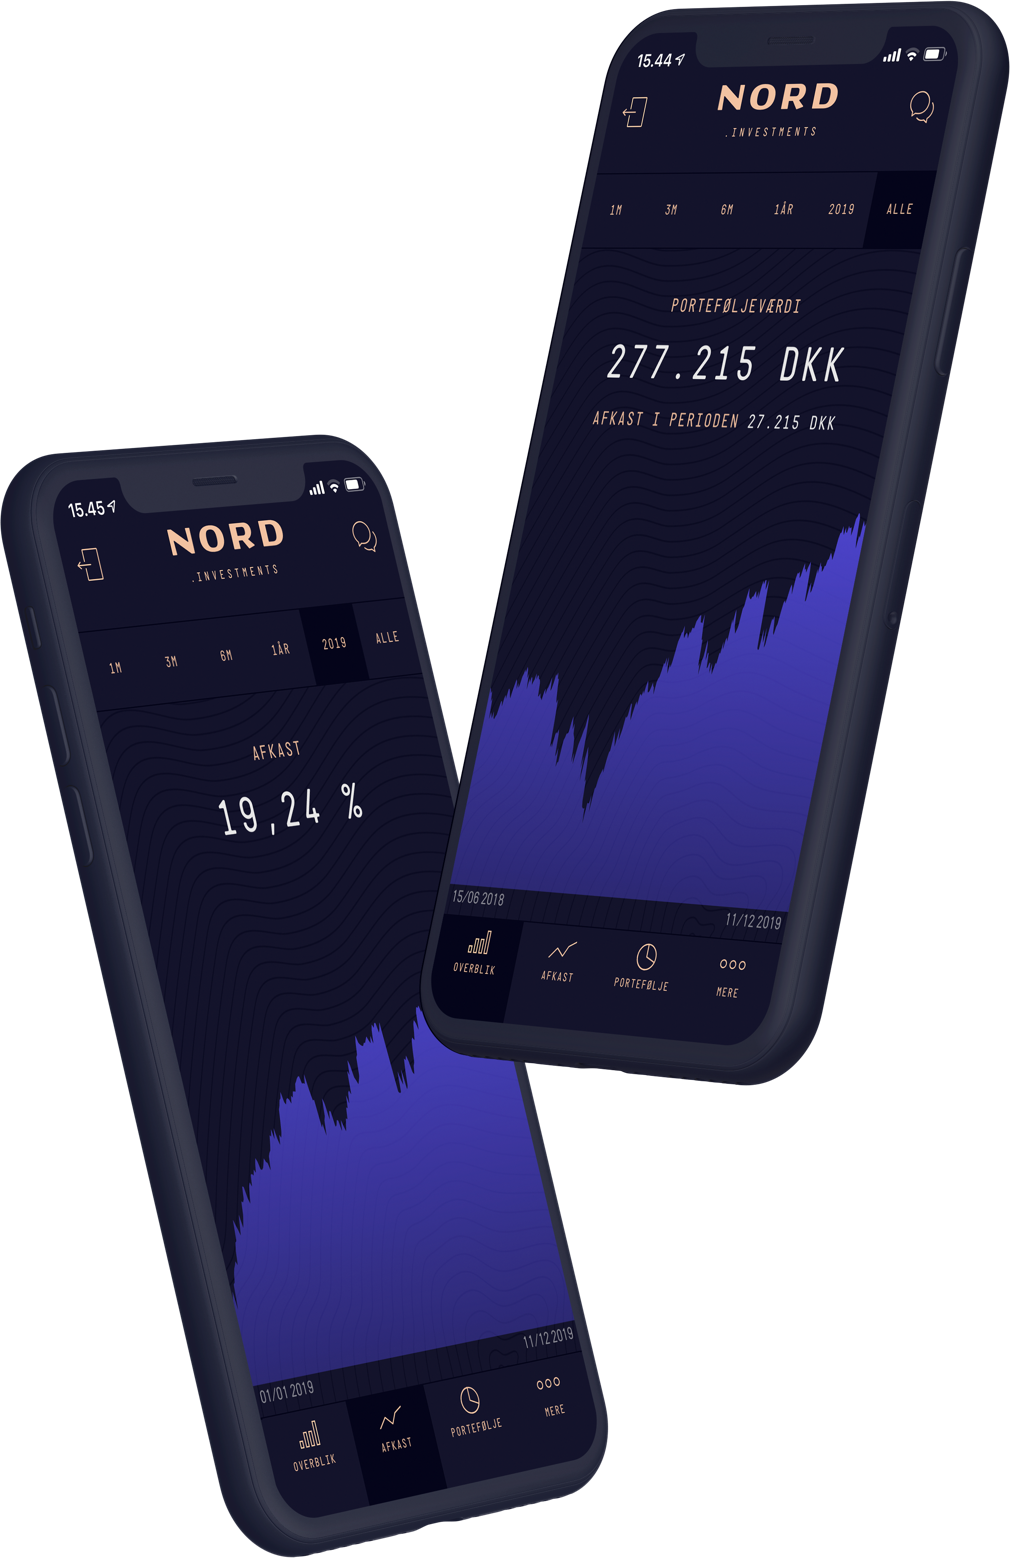 NORD app